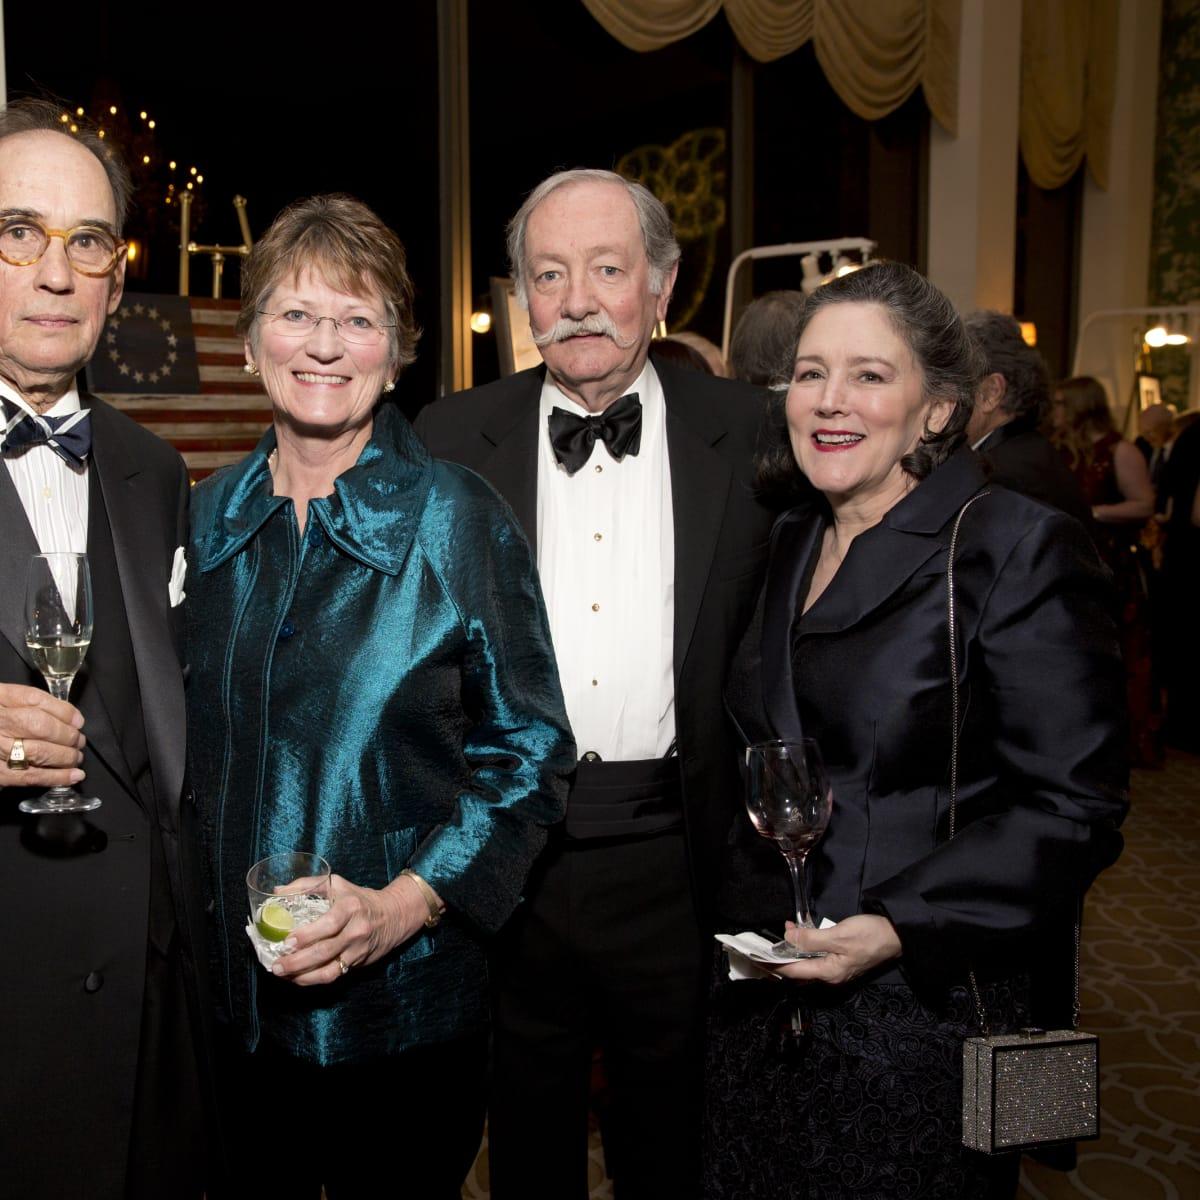 Friends of Fondren Library, Feb. 2016, Guy Jackson, Dr. Julie Boom, Dr. Marc Boom, Clare Jackson